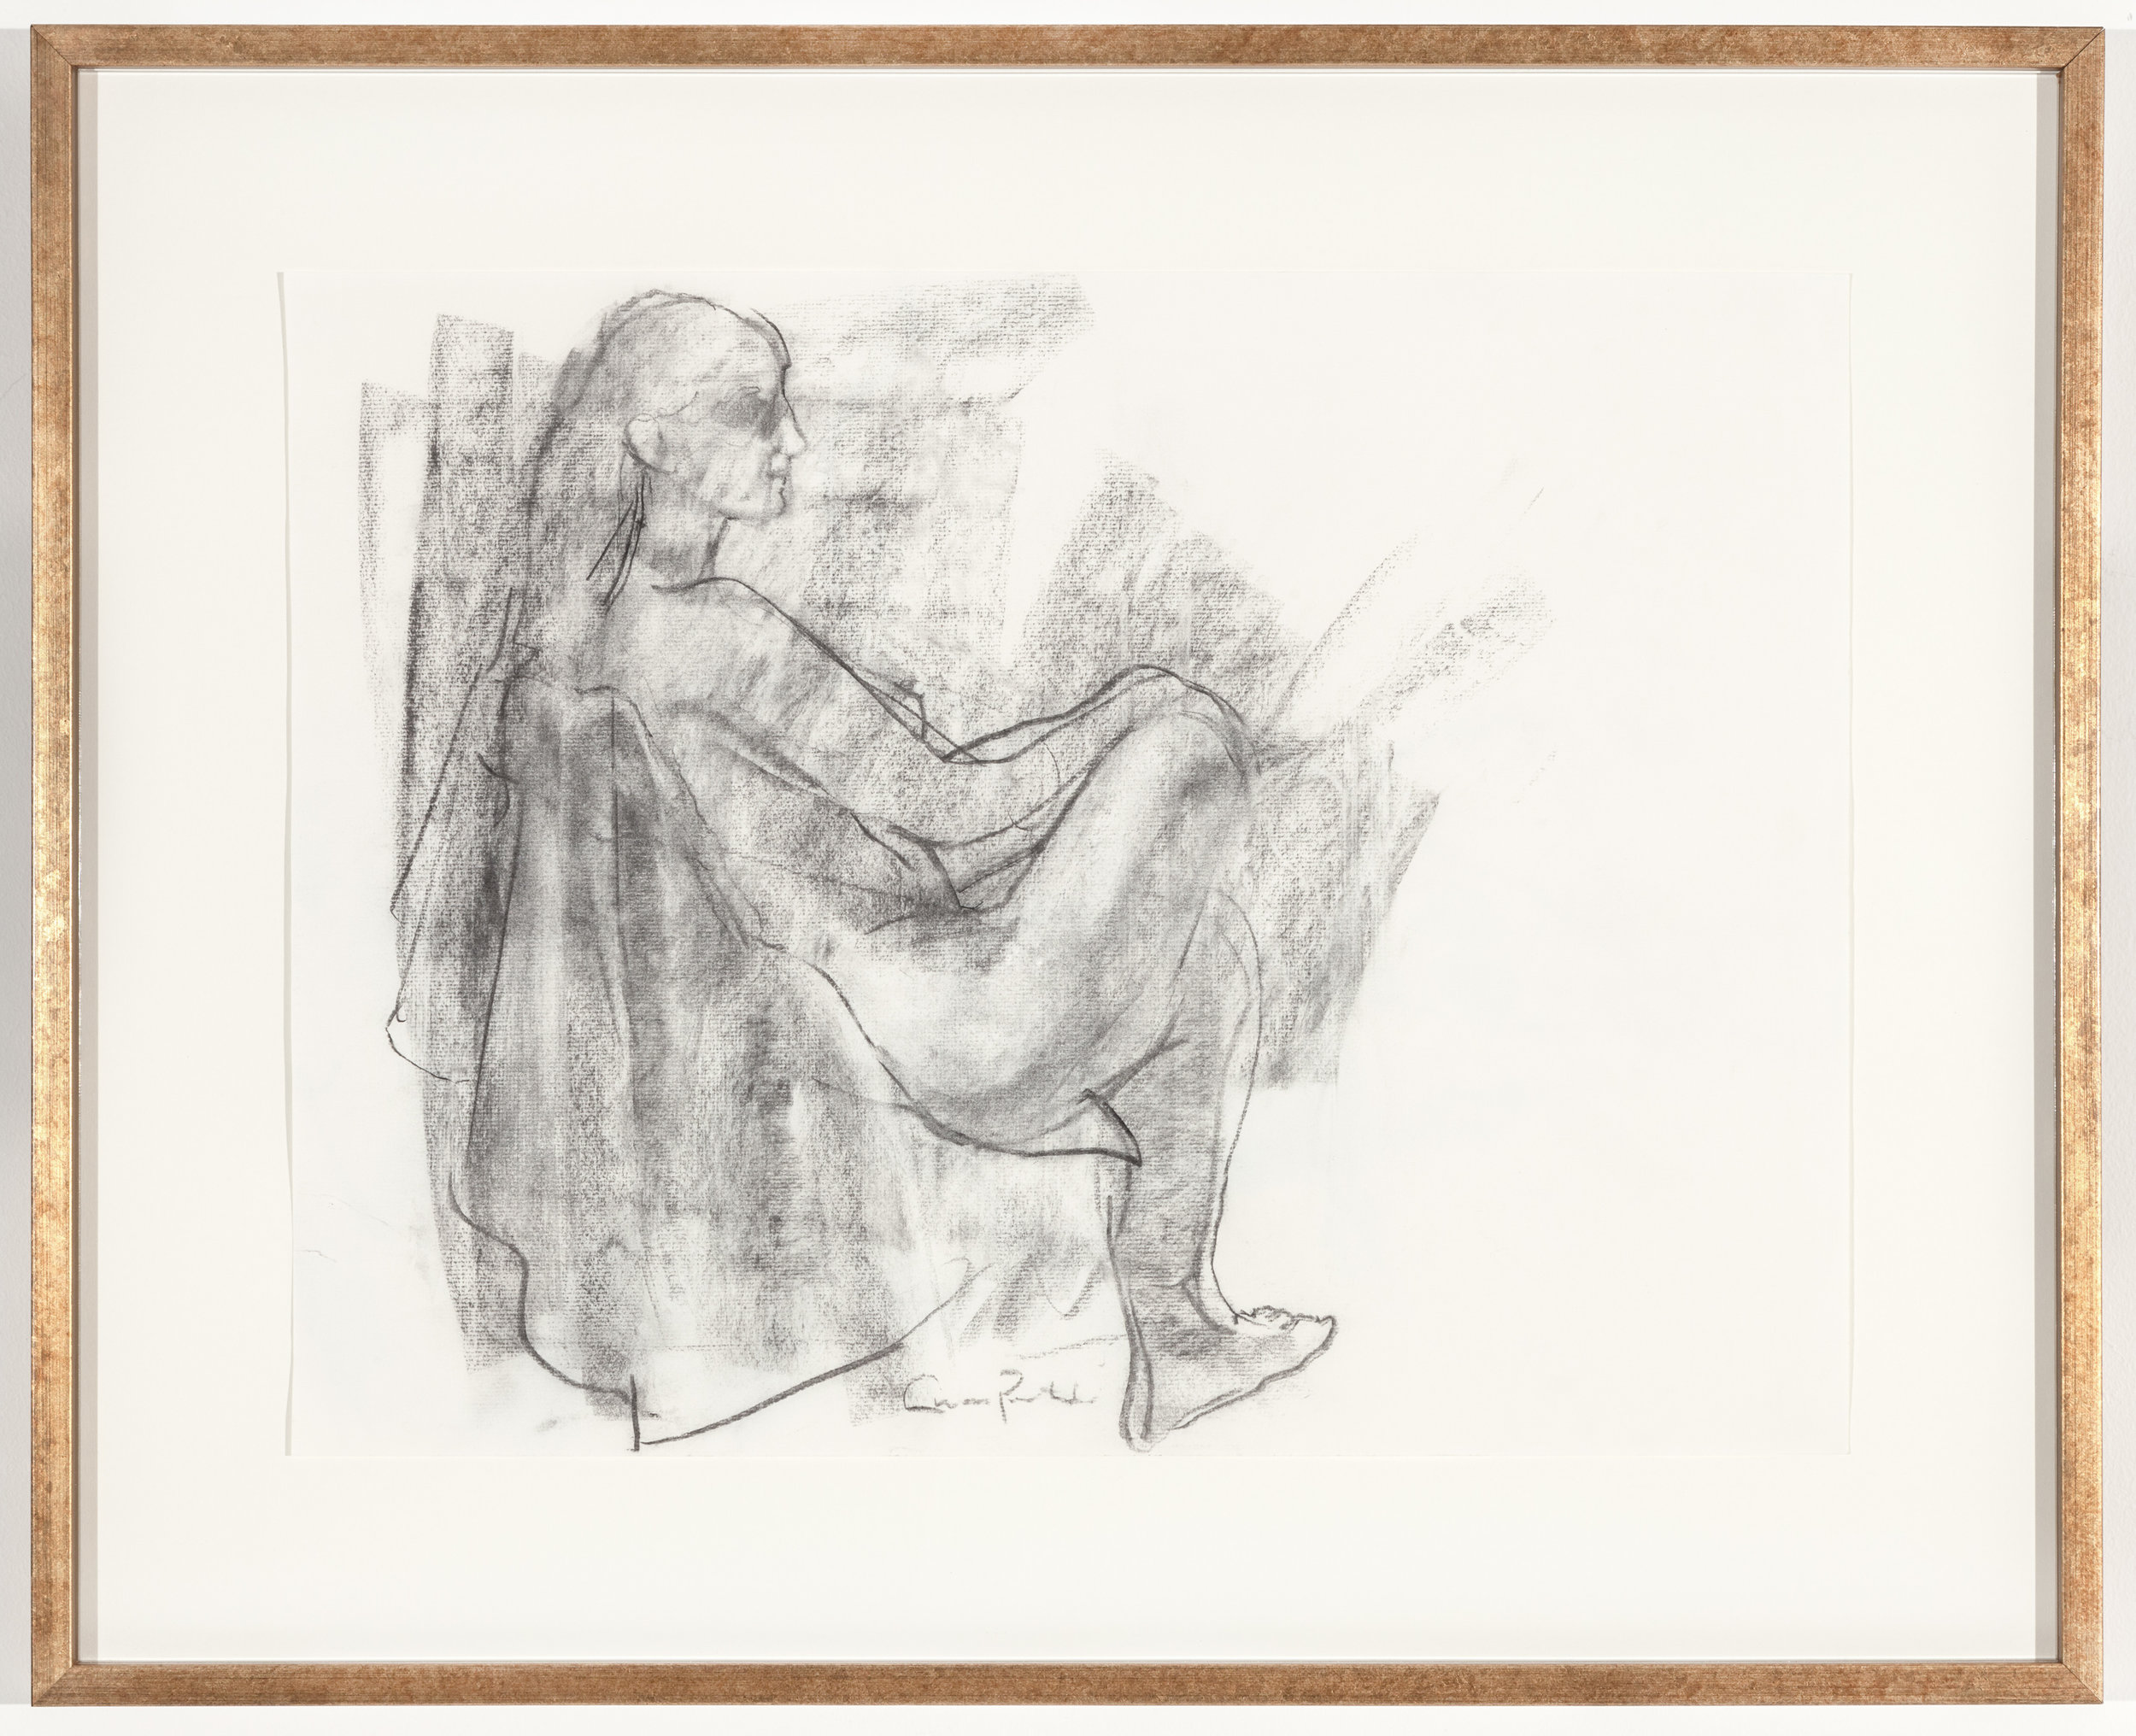 Sitting Female Figure Portrait (2012)